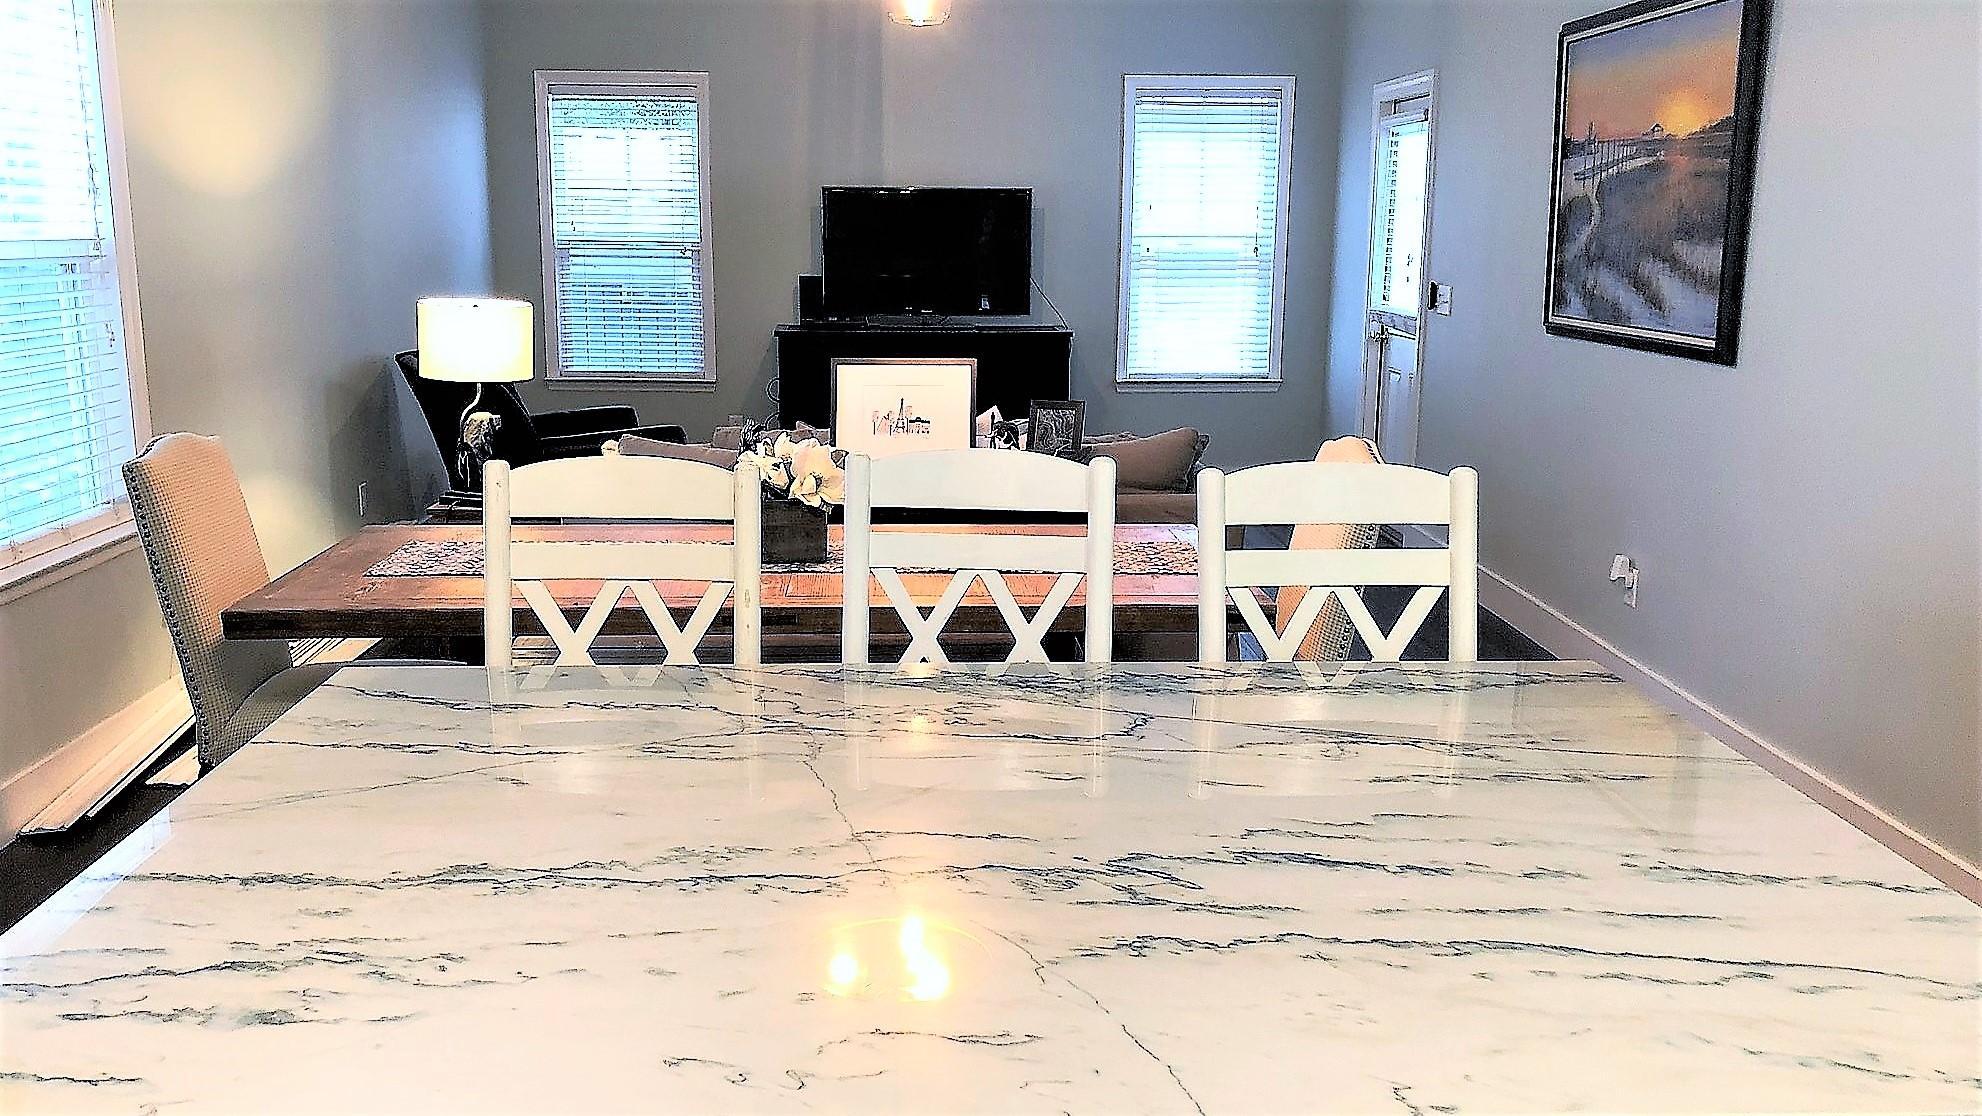 Fairway Villas Homes For Sale - 1542 Little Rock, Charleston, SC - 8